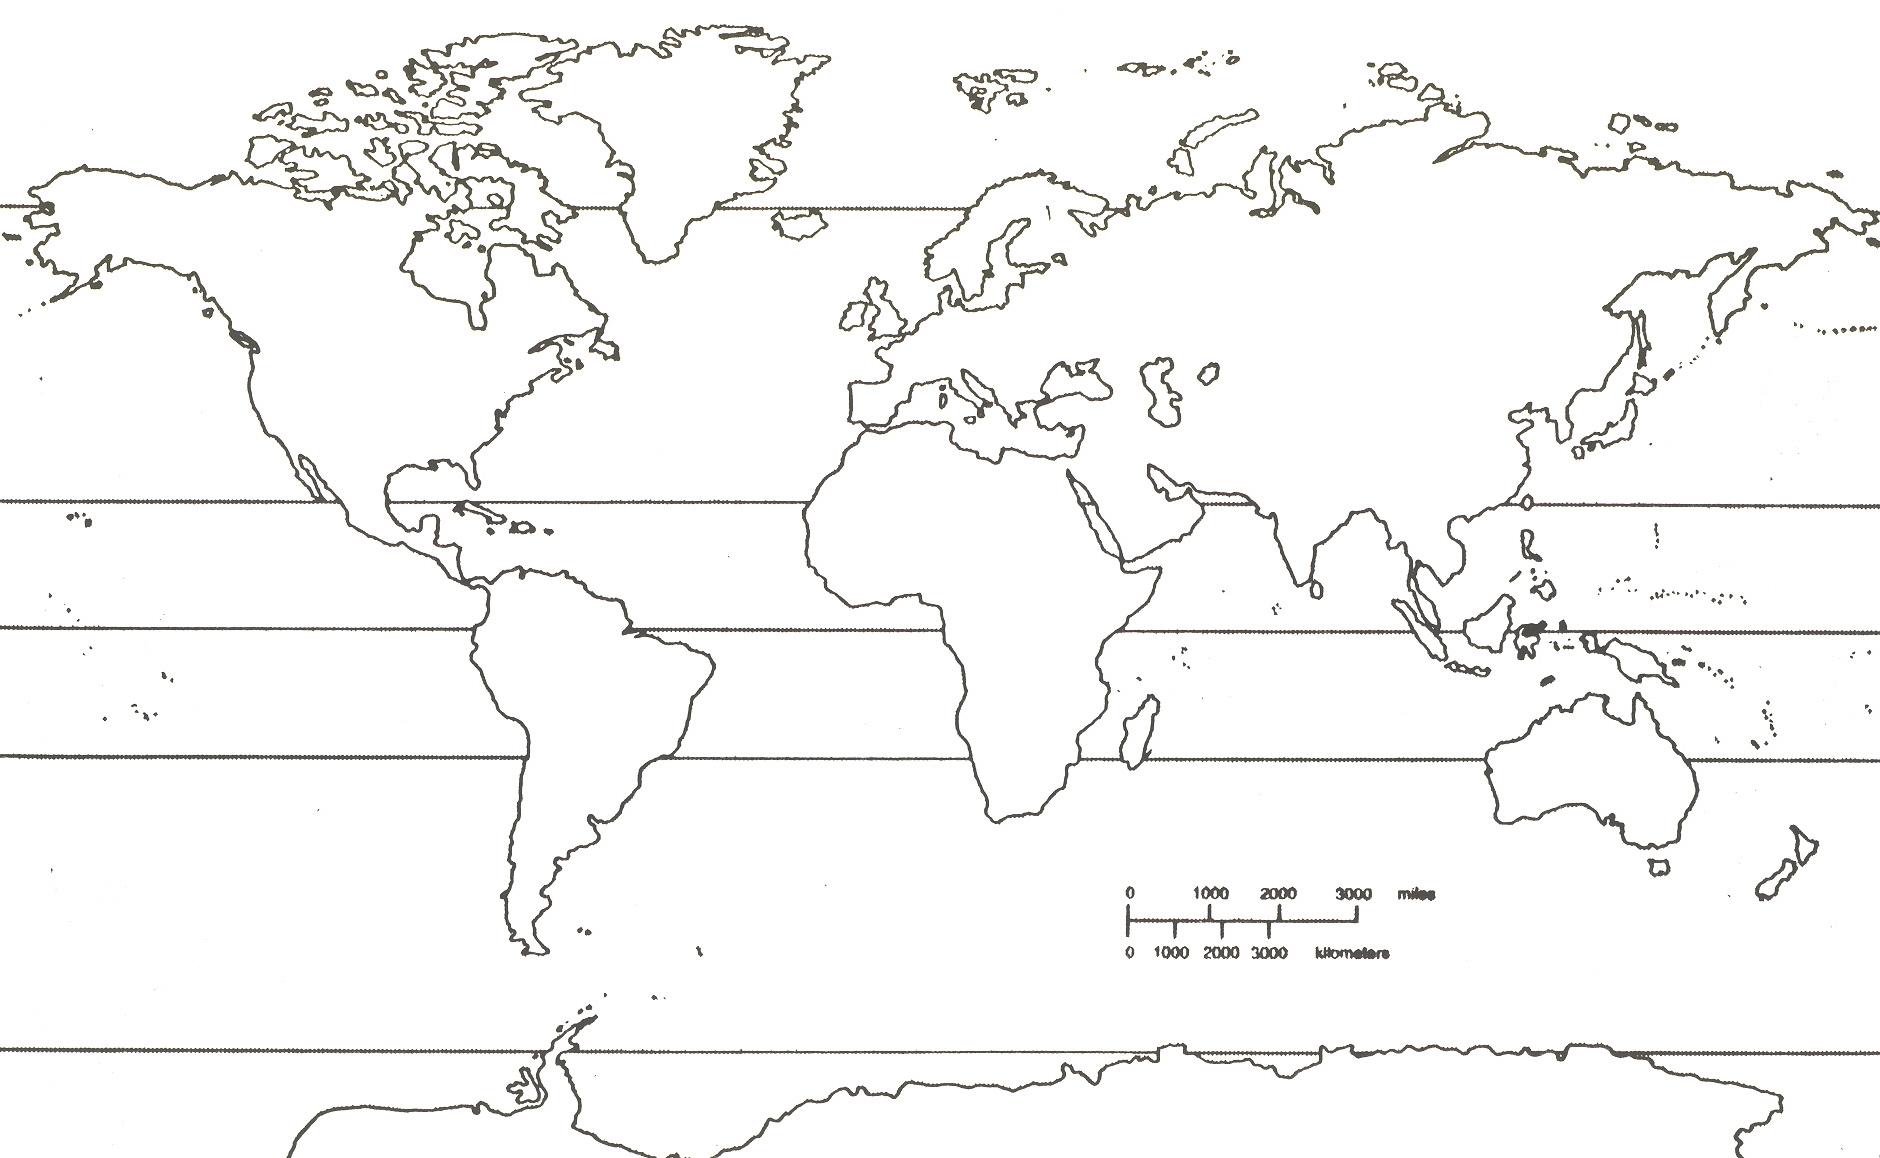 Image world mapg alternative history fandom powered by wikia world mapg gumiabroncs Choice Image